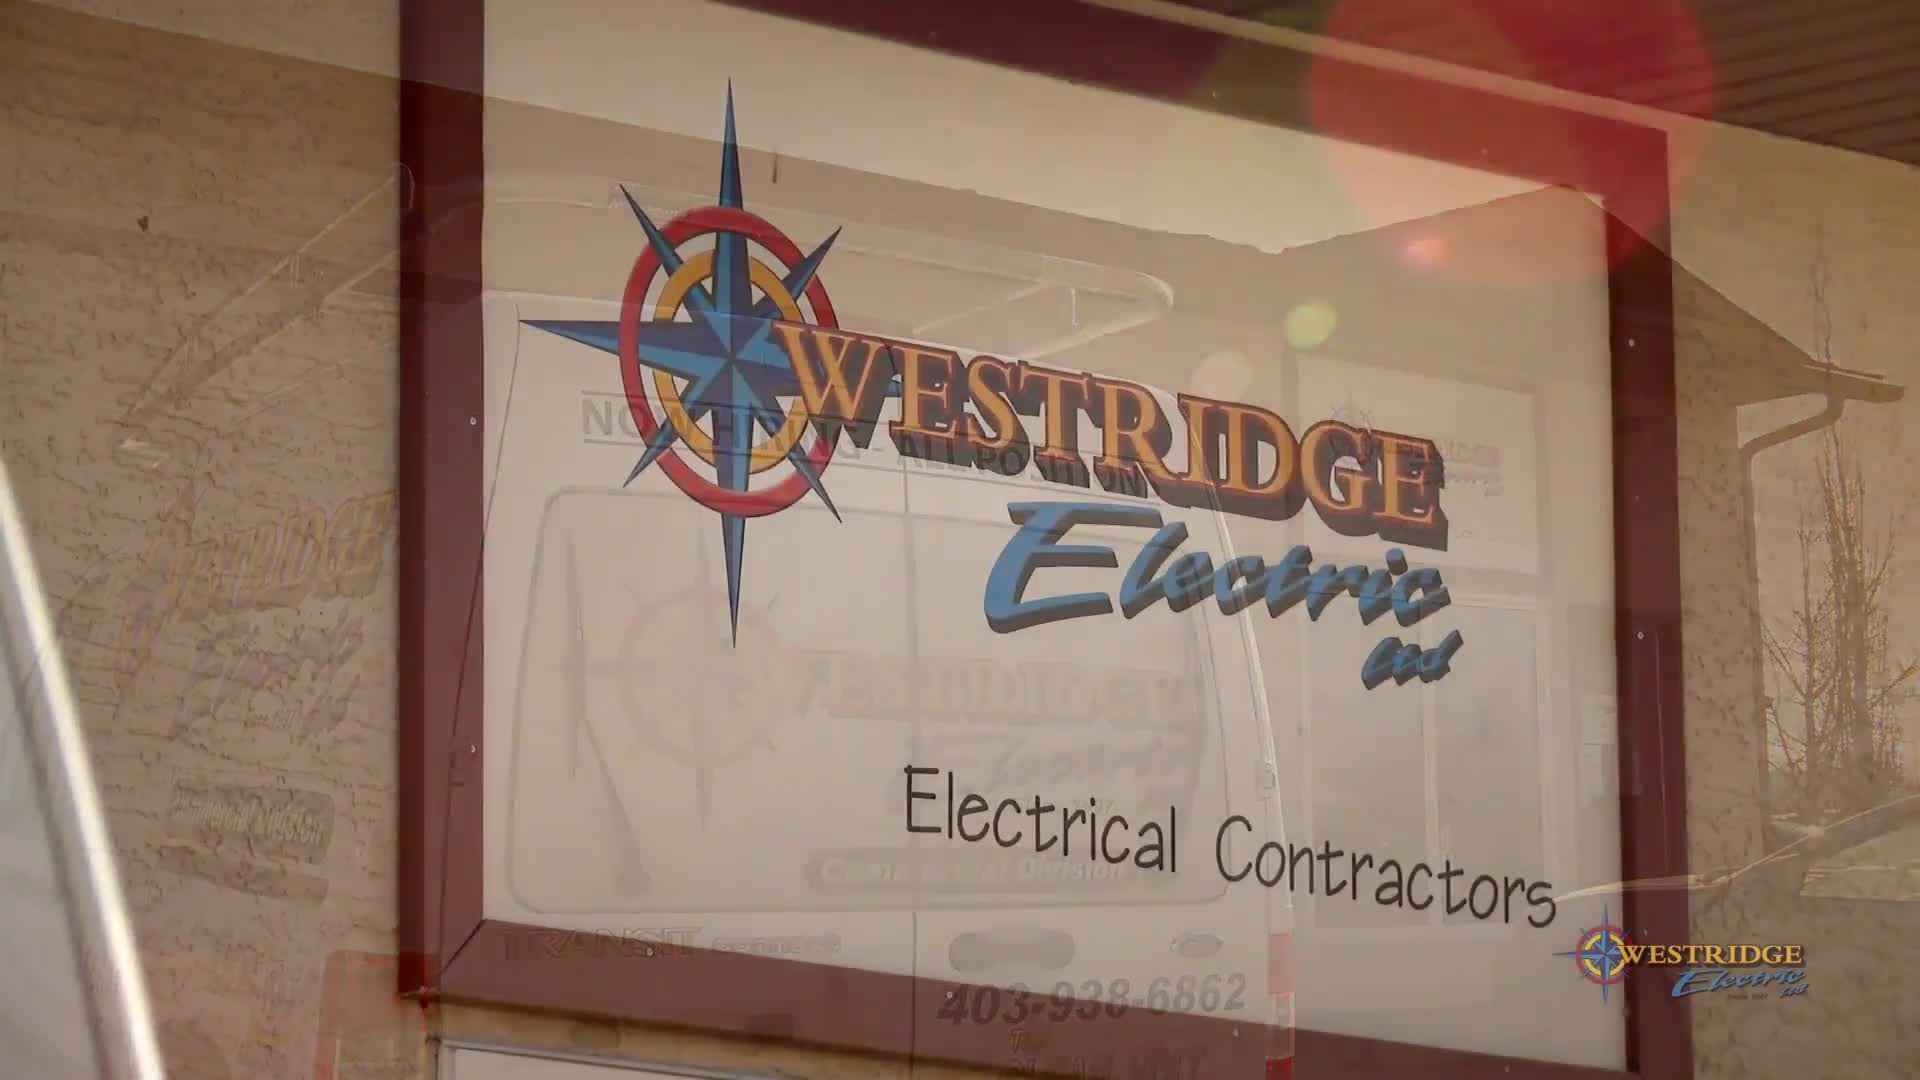 Westridge Electric